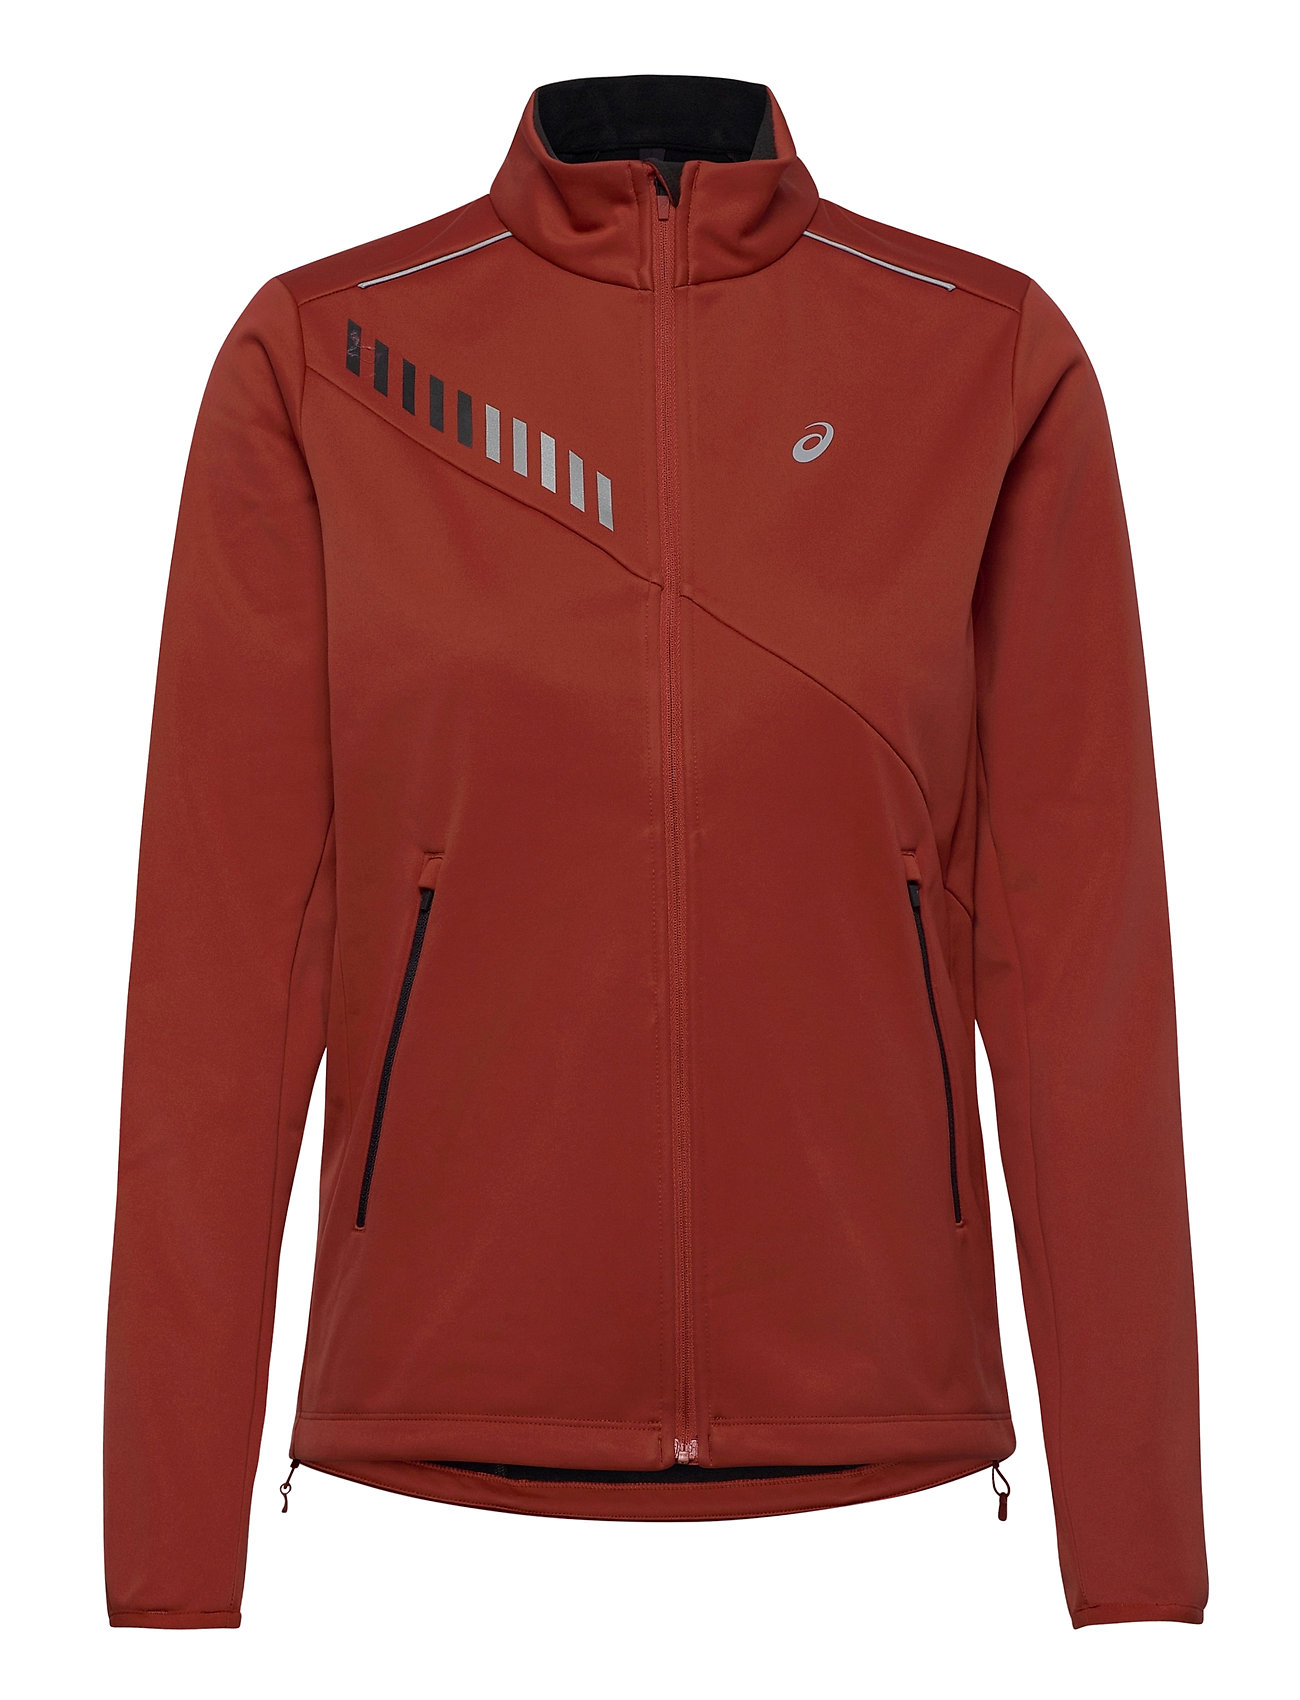 ASICS Sportoberteile | Lite-Show Winter Jacket Outerwear Jackets Utility Jackets Orange ASICS